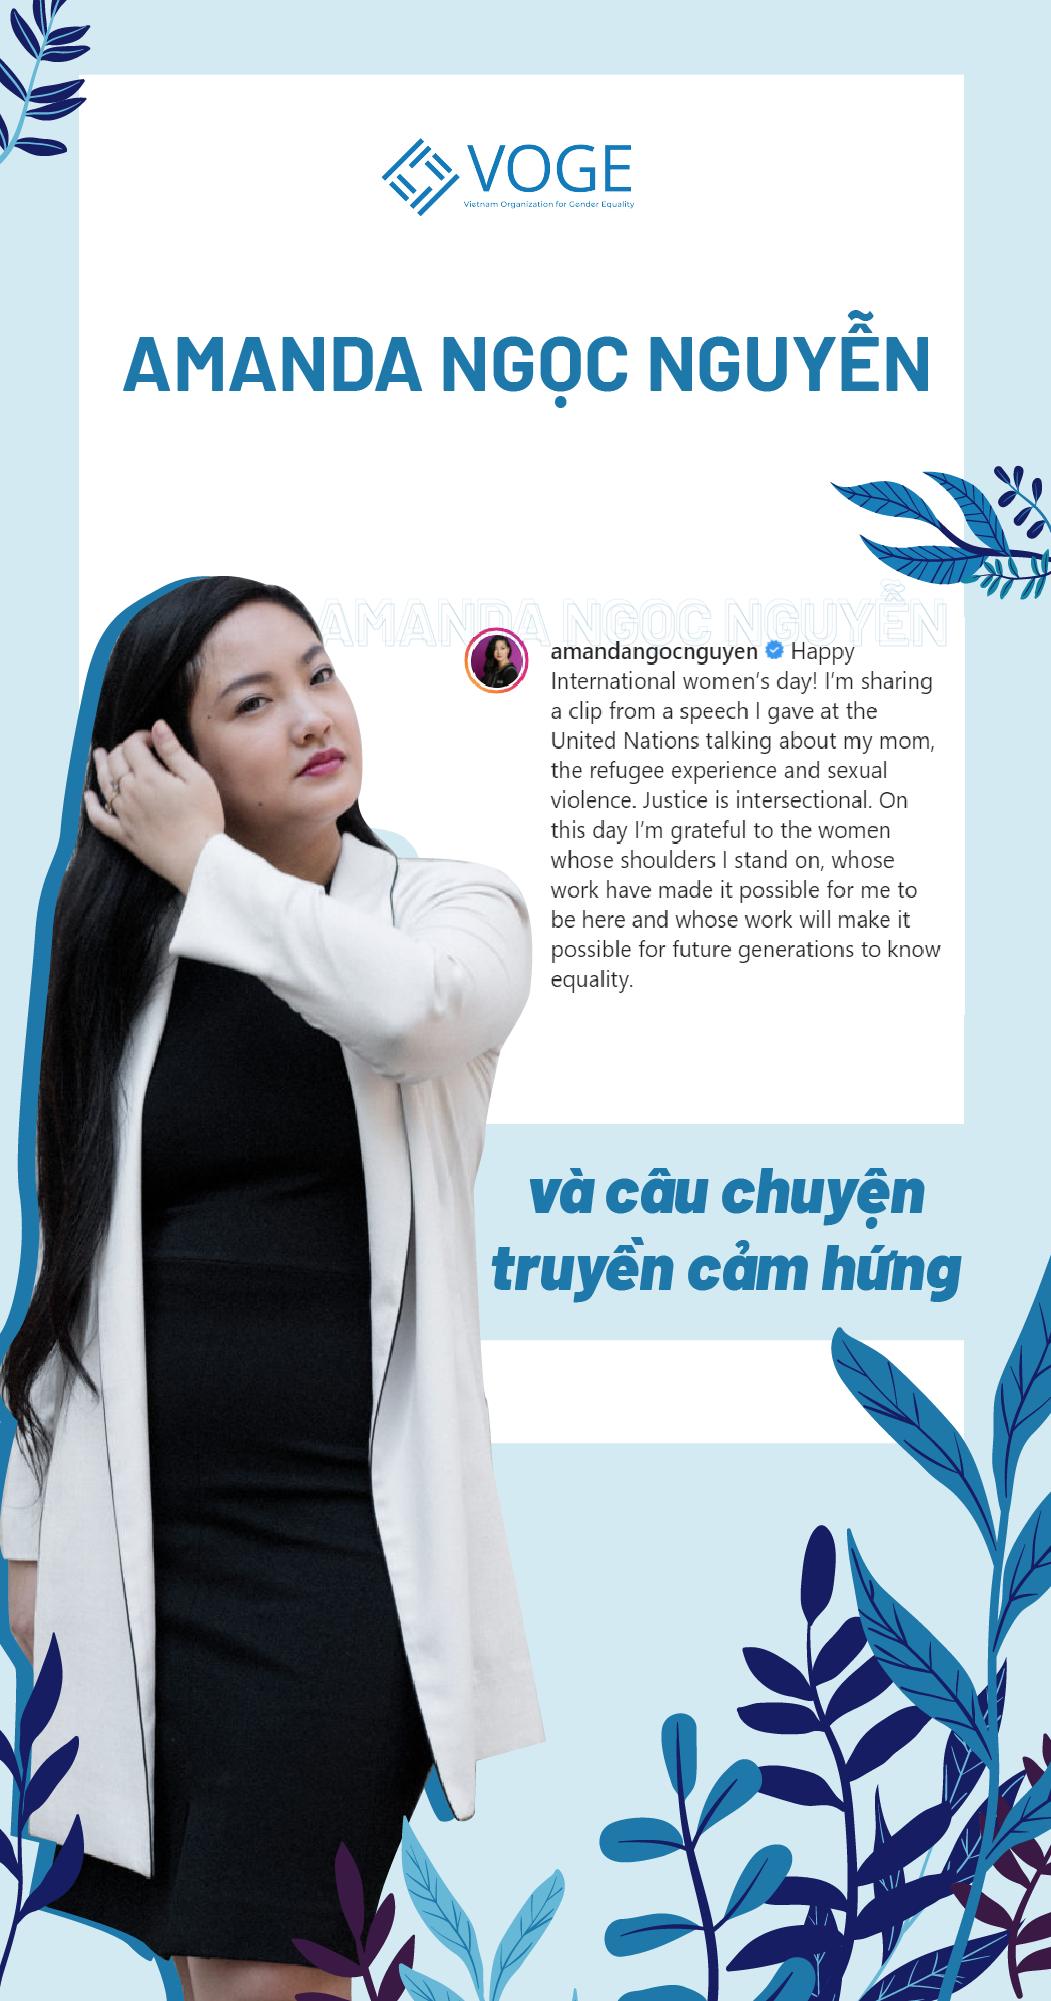 Amanda Ngoc Nguyen and her inspiring story